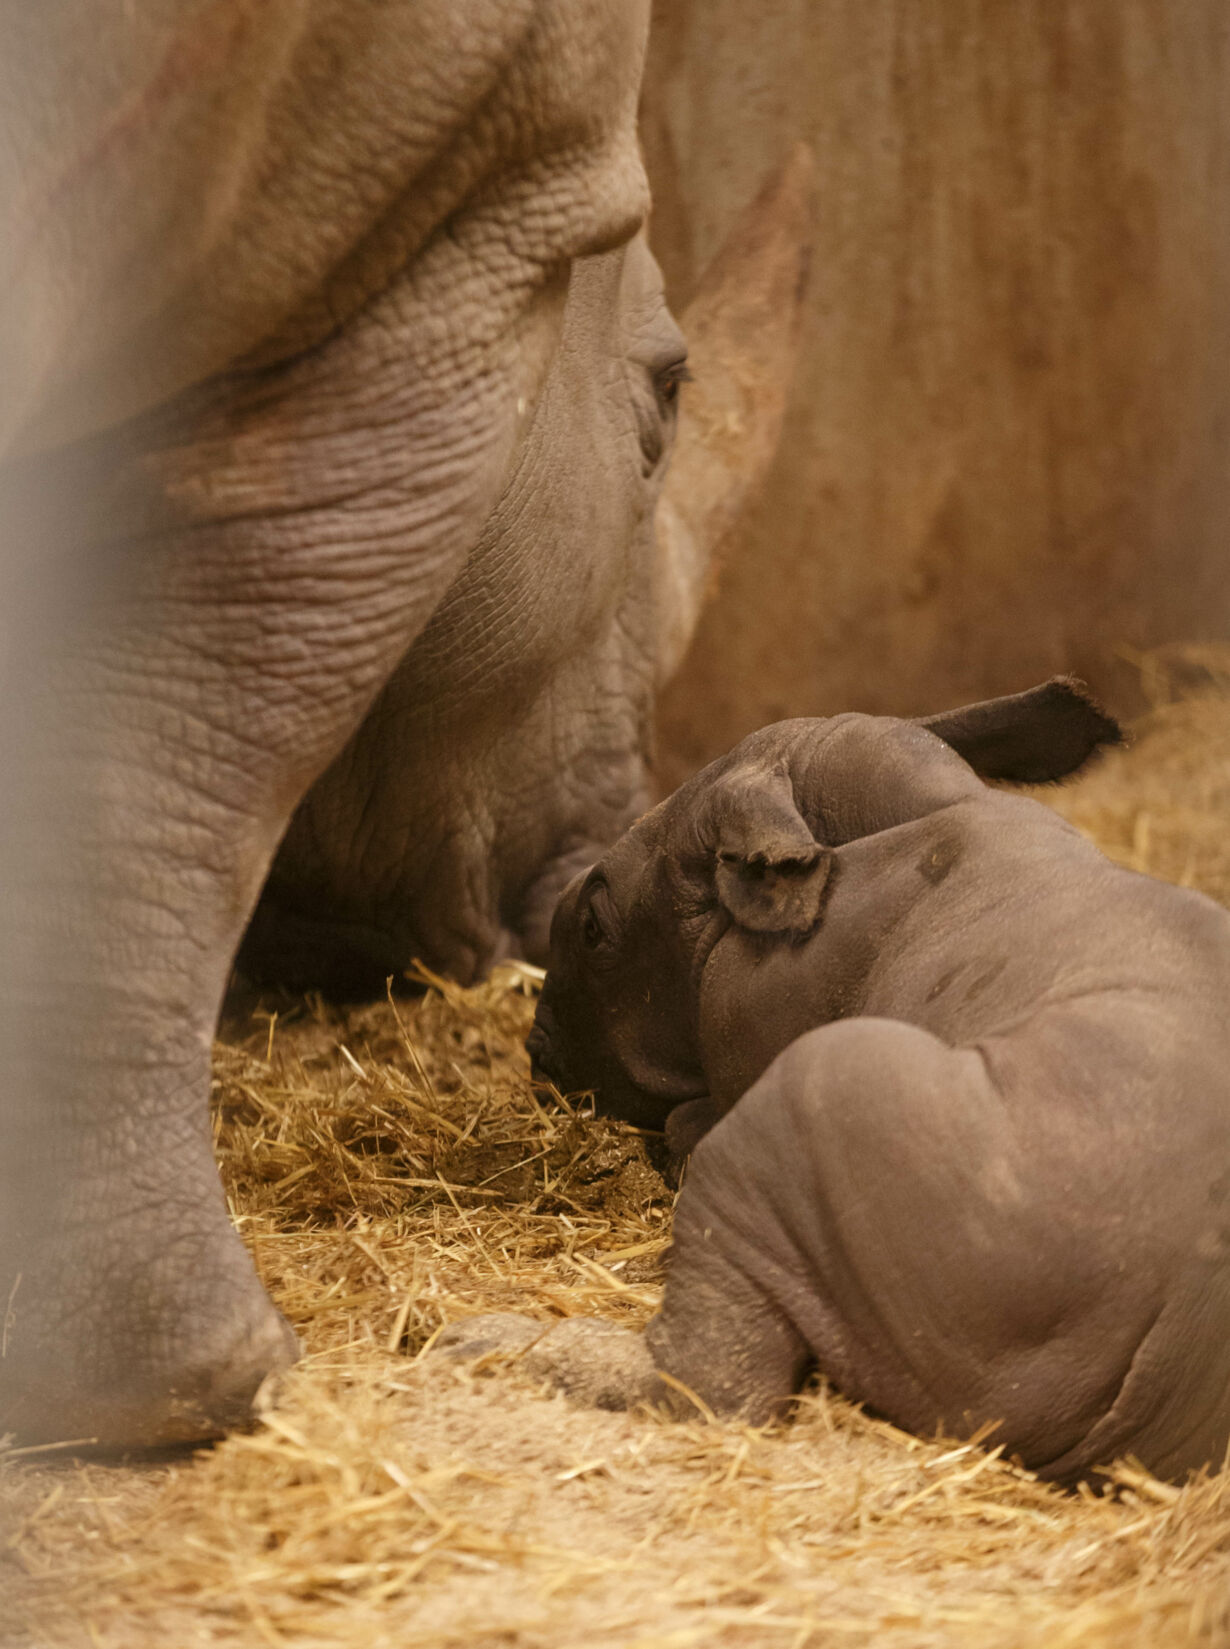 Nyfødt næsehornsunge 3